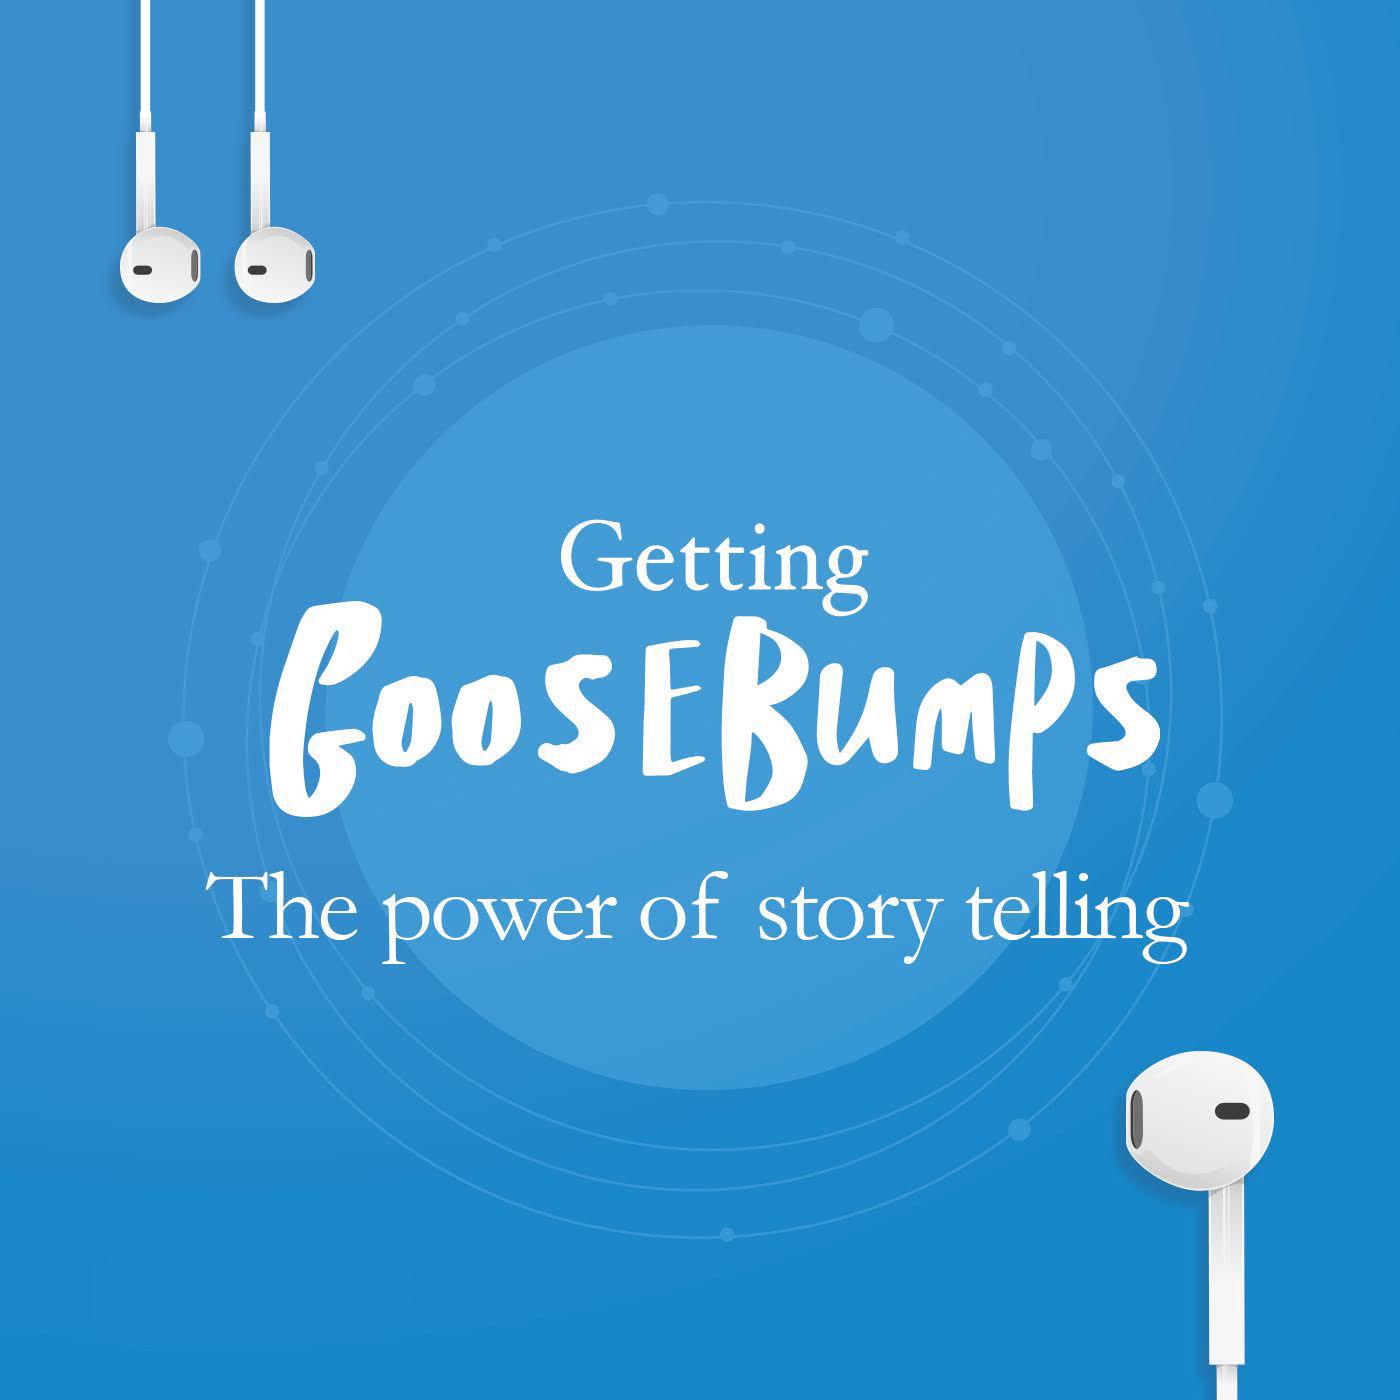 Getting Goosebumps: The Power of Storytelling